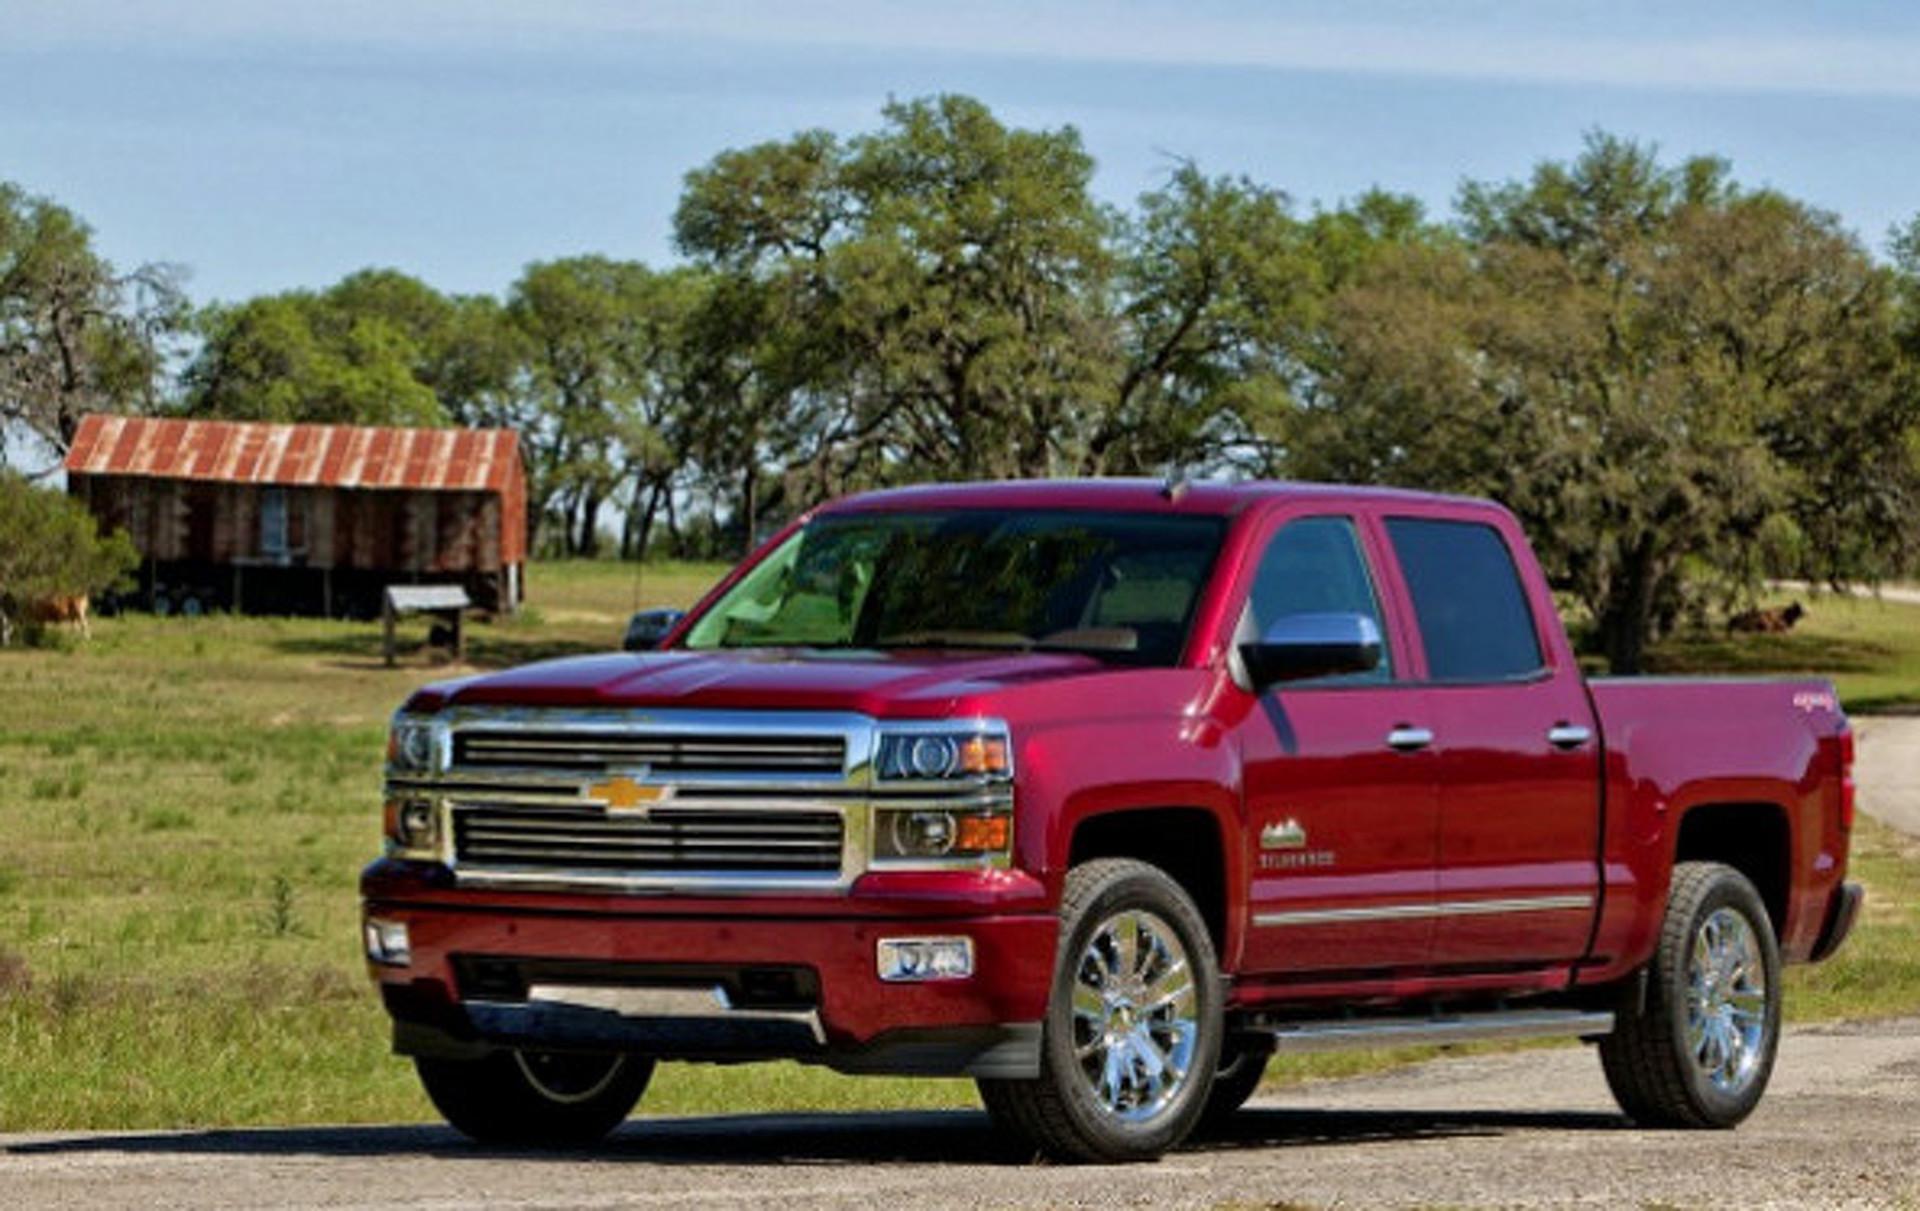 General Motors 3D Scanning Competitors' Vehicles